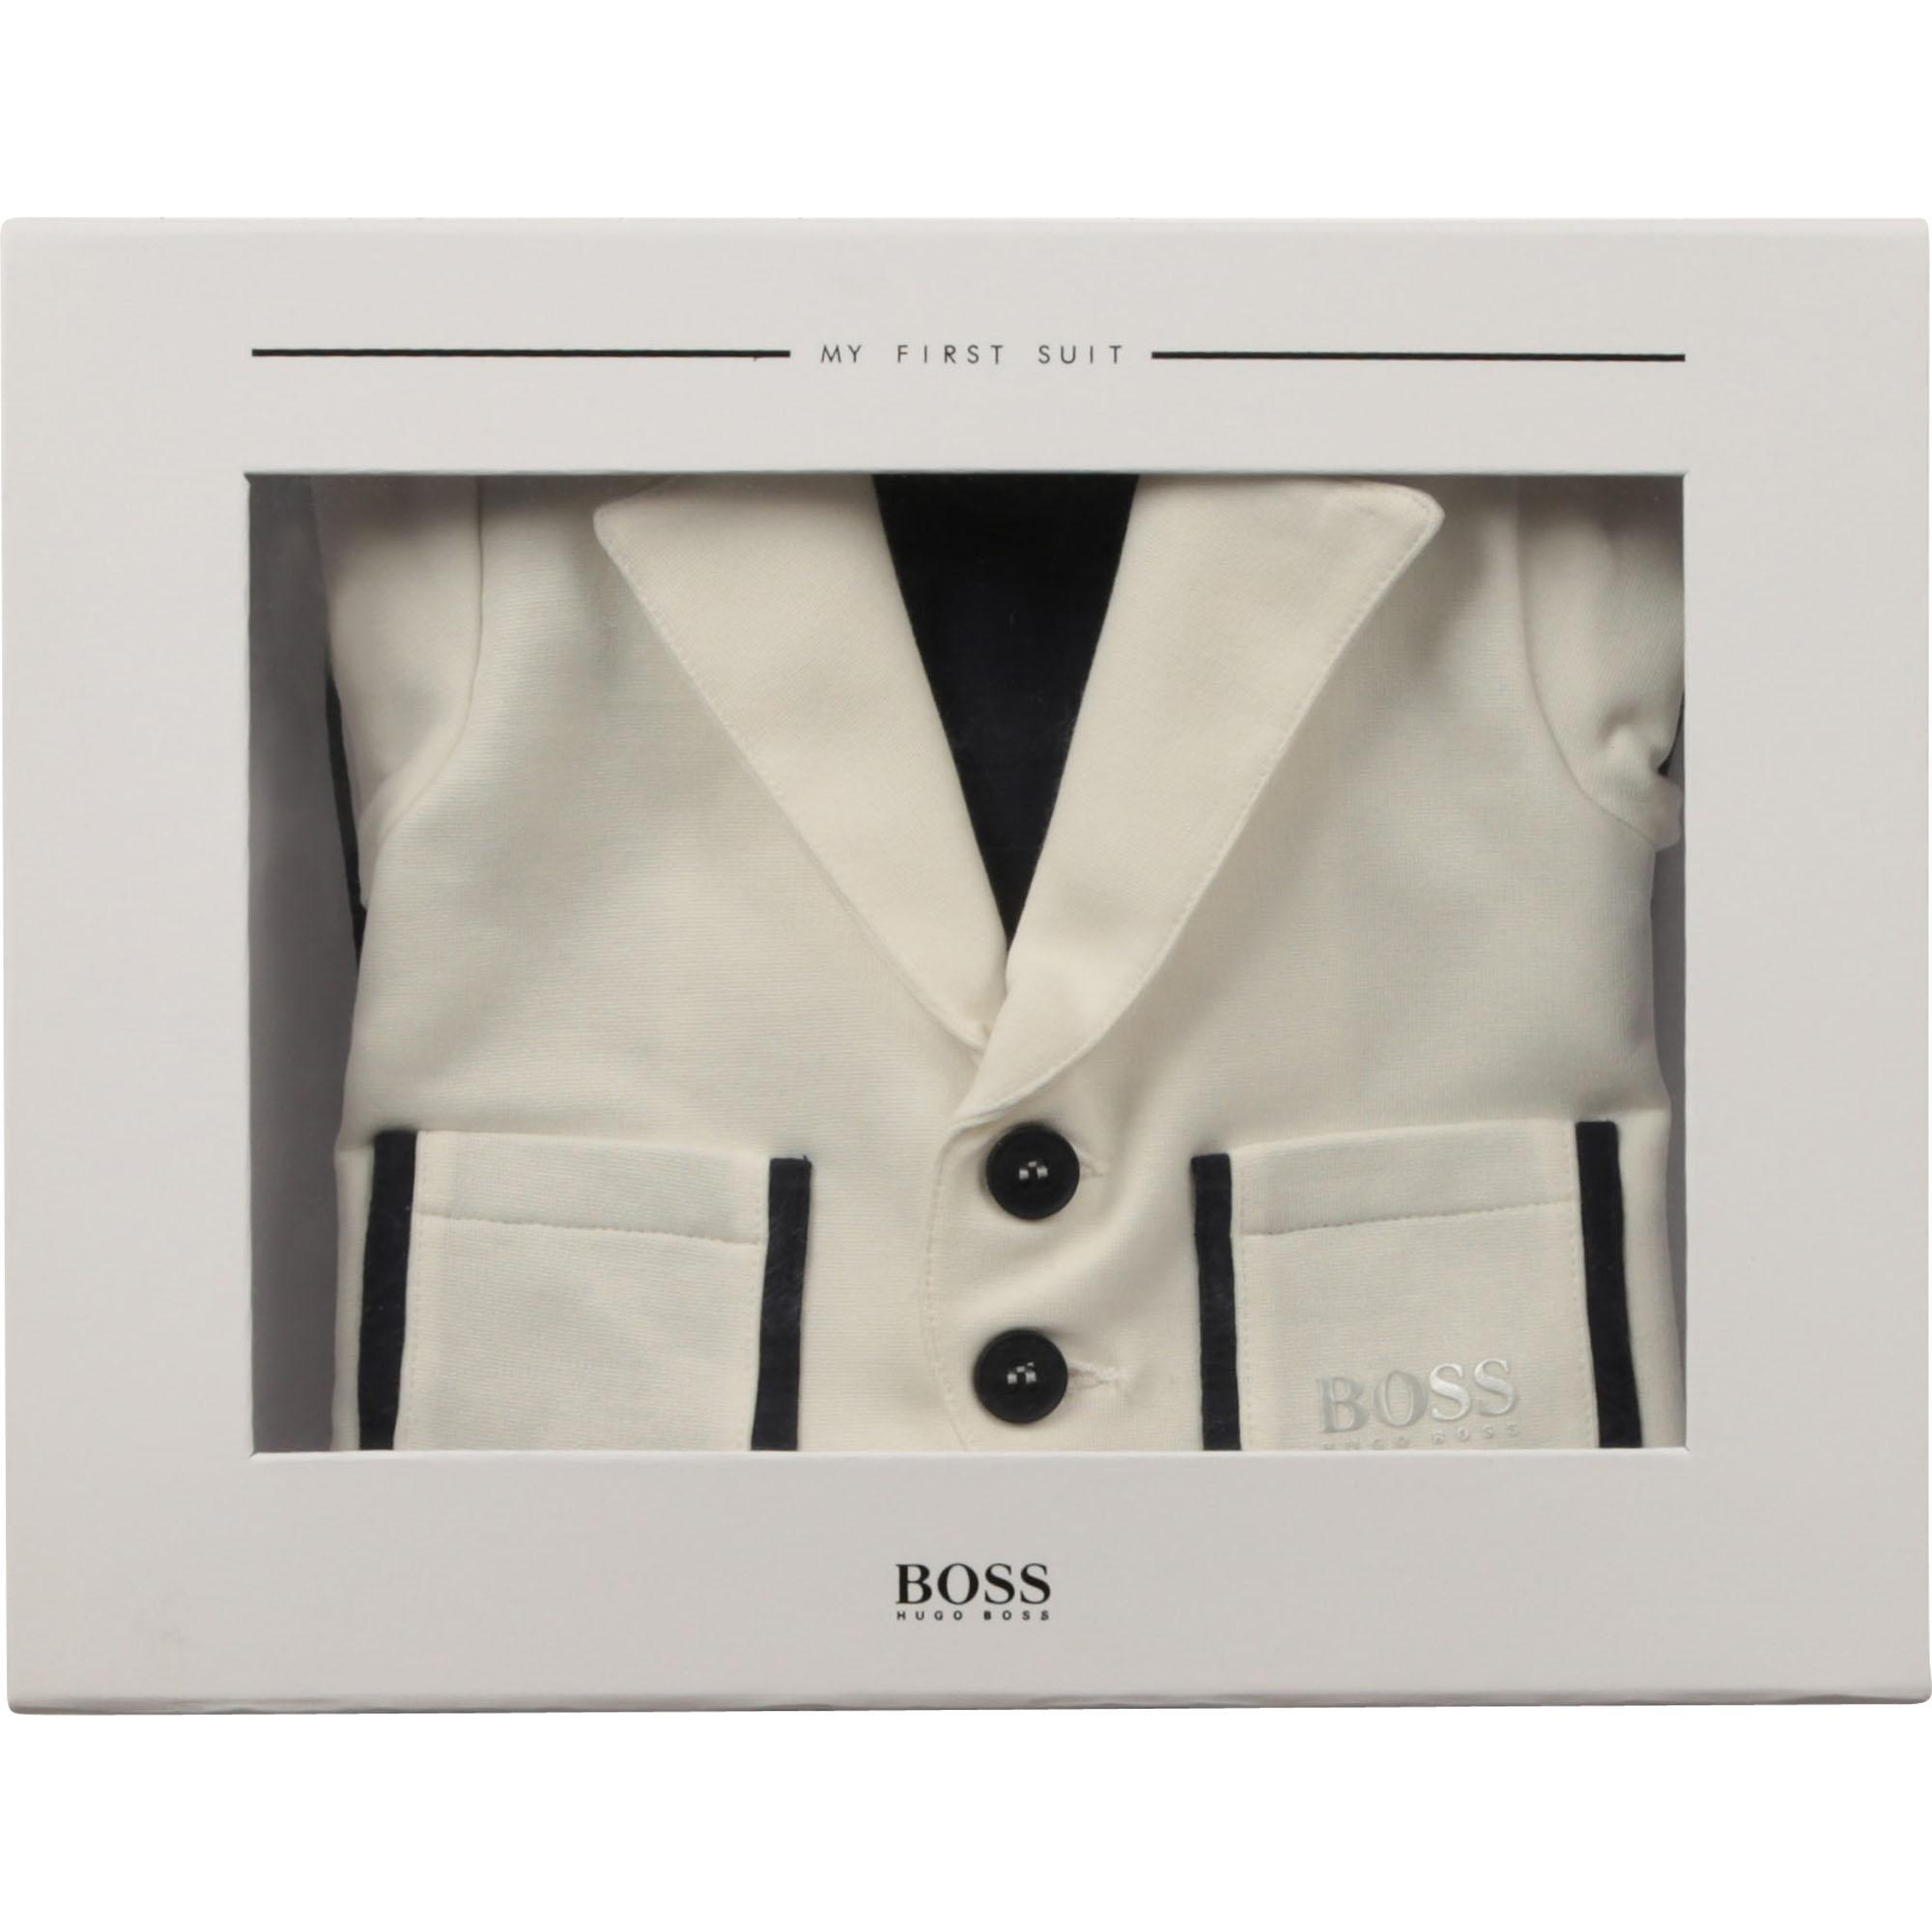 Milano suit-inspired romper BOSS for BOY